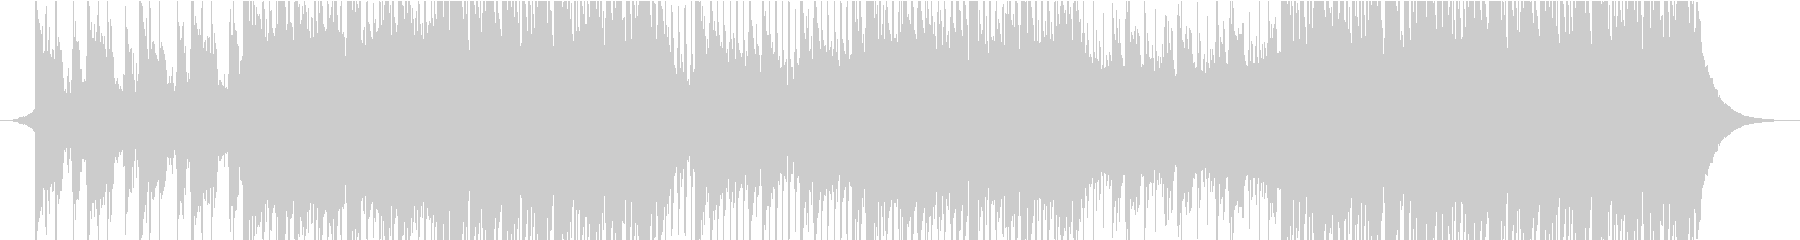 Upbeat Folk Acousticの未再生の波形